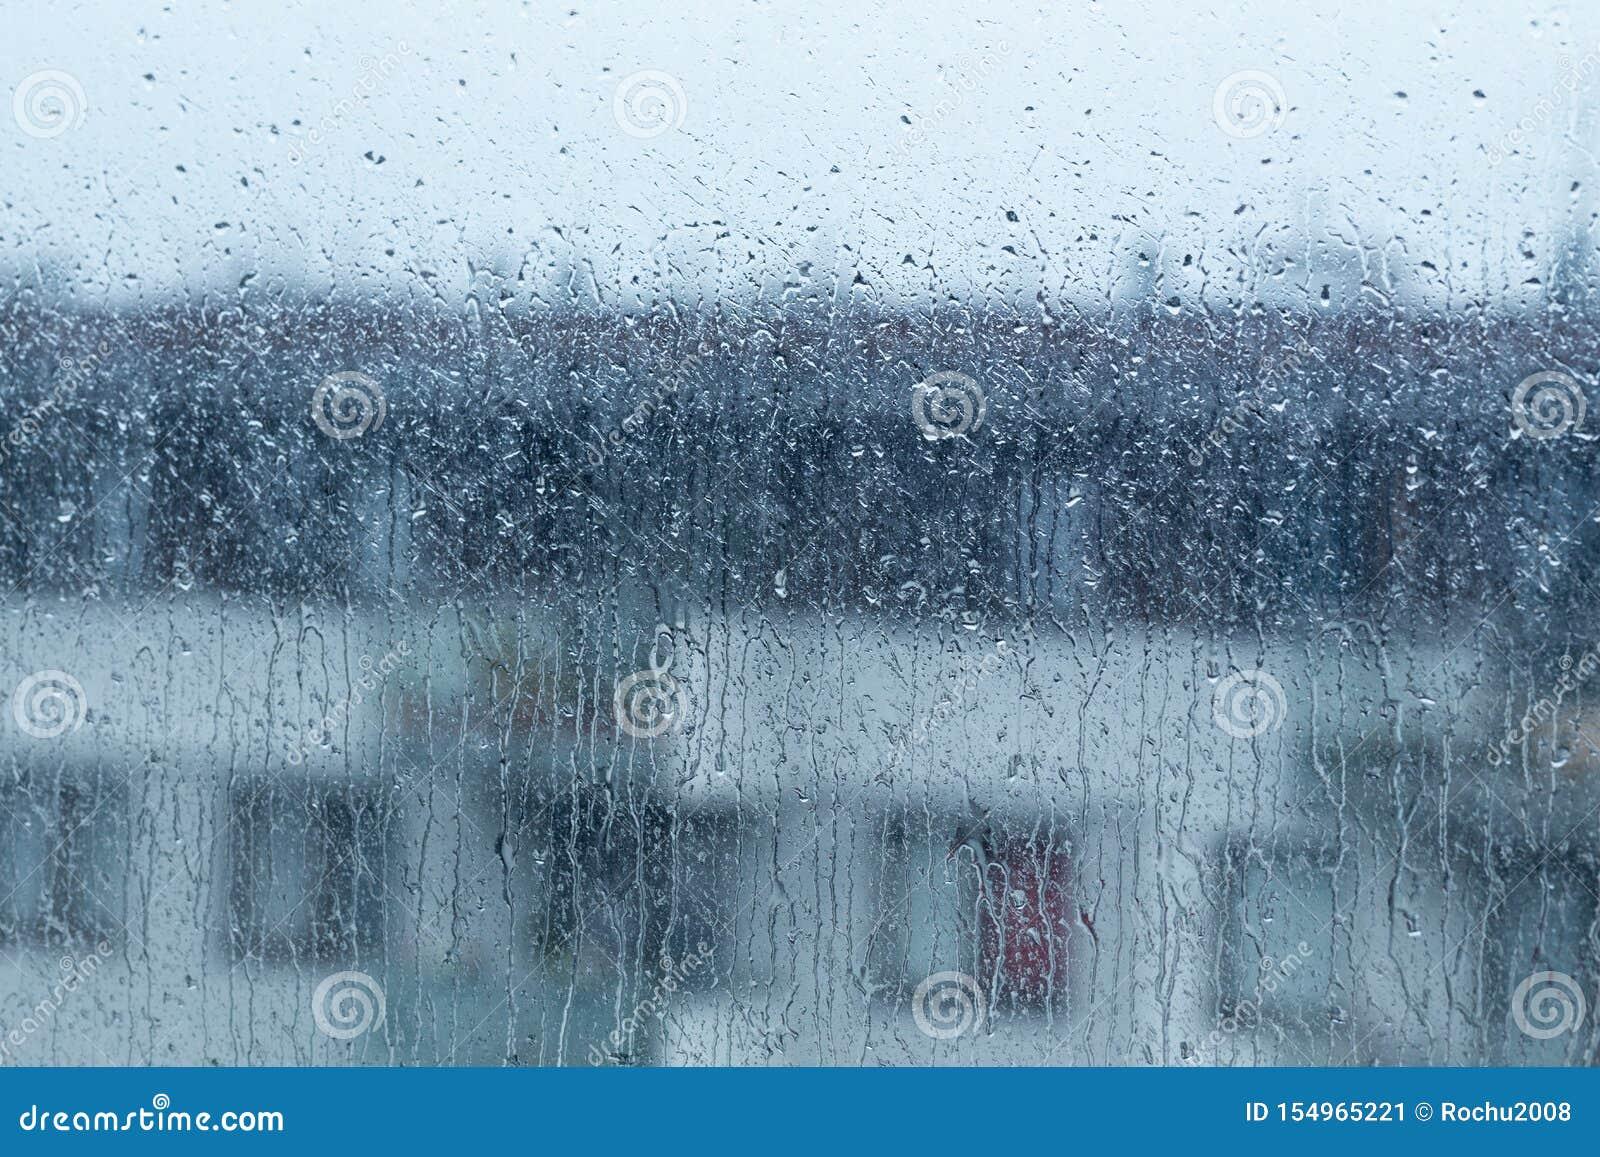 Lluvia que cae fuera de la ventana, tiempo lluvioso